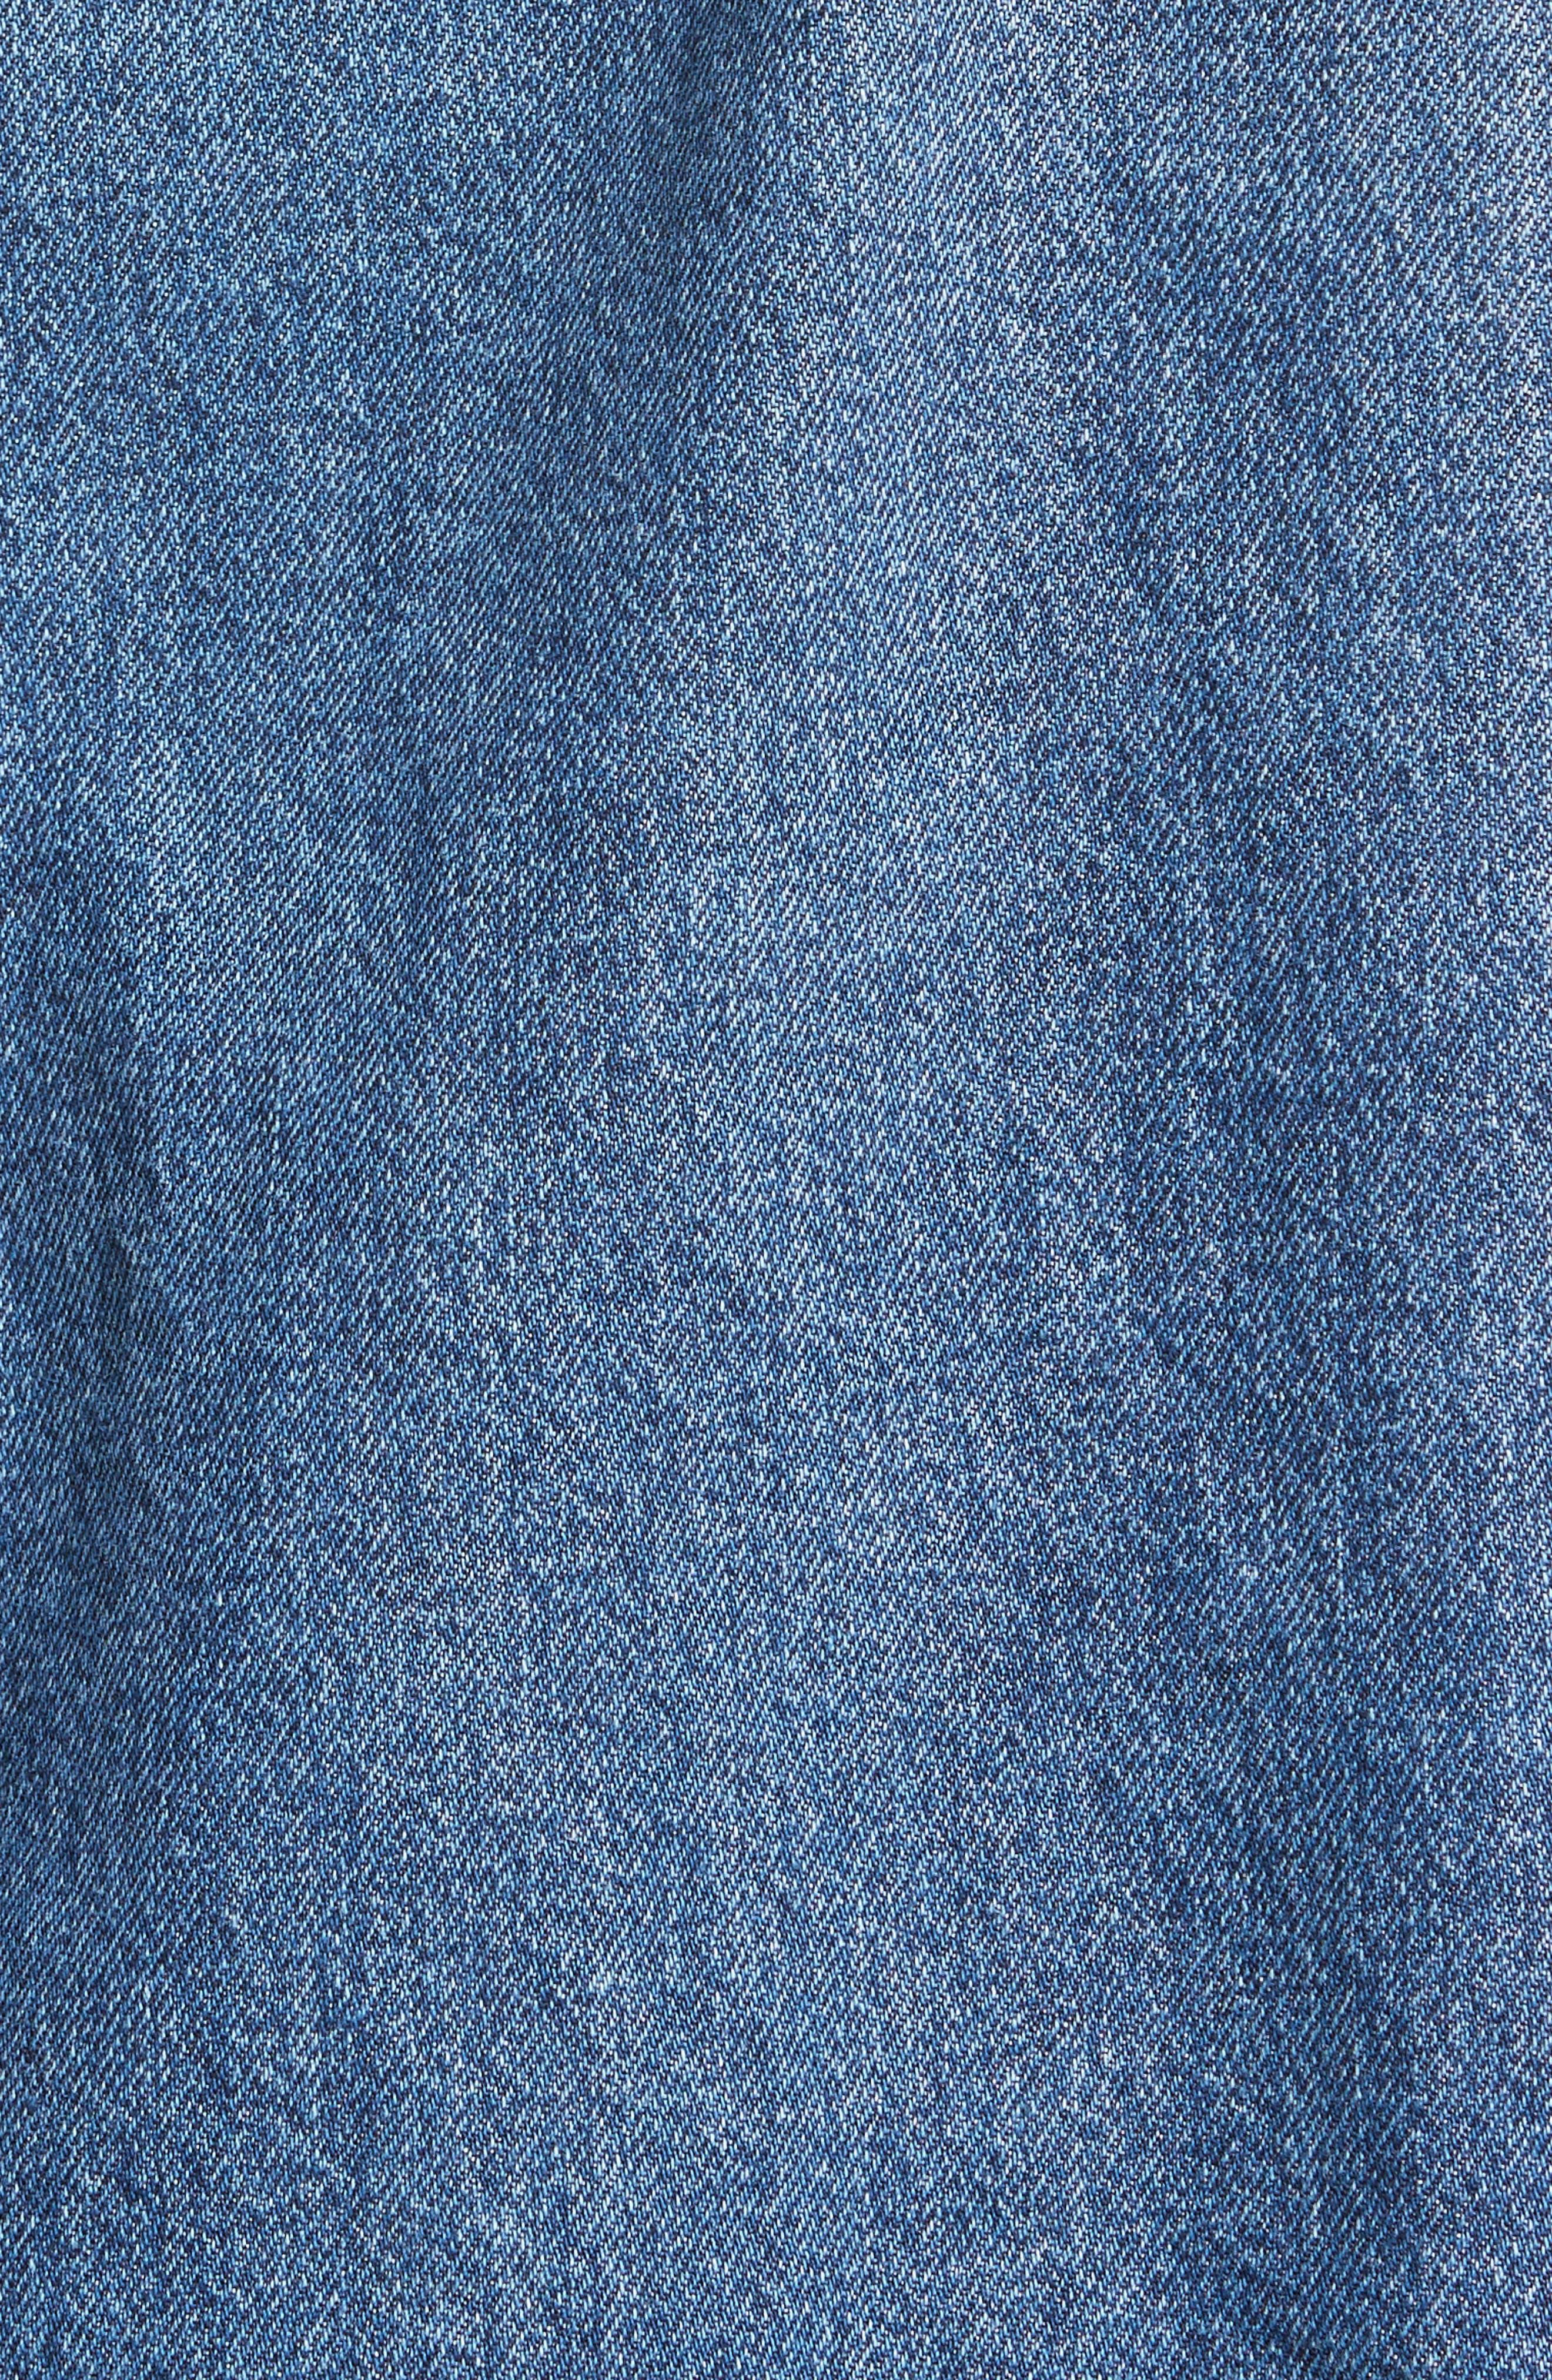 Tent Denim Jacket,                             Alternate thumbnail 5, color,                             MID BLUE